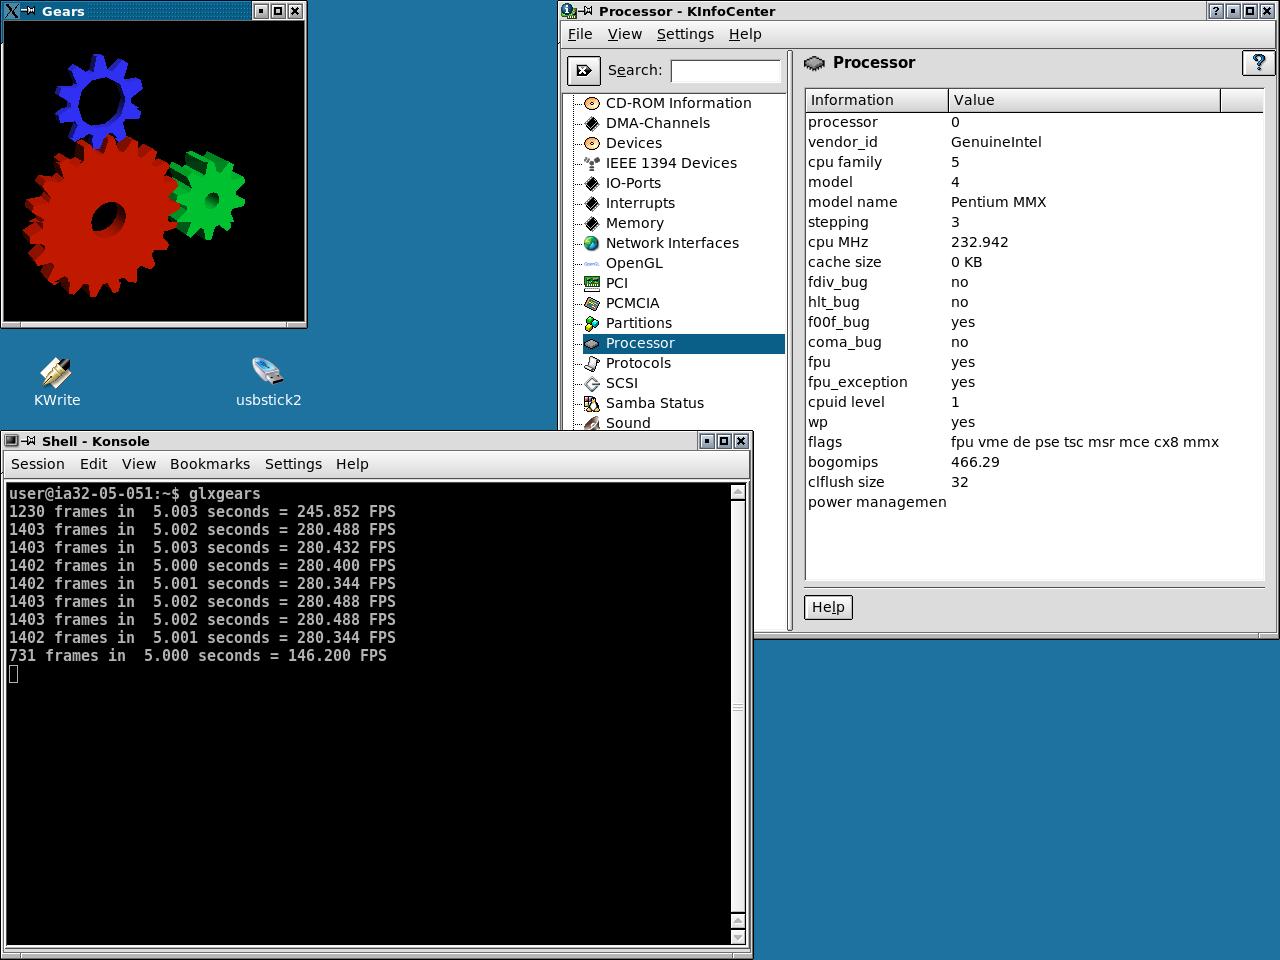 [Bild: screenshot_Pentium_MMX_233_1280x960_24bpp.png]